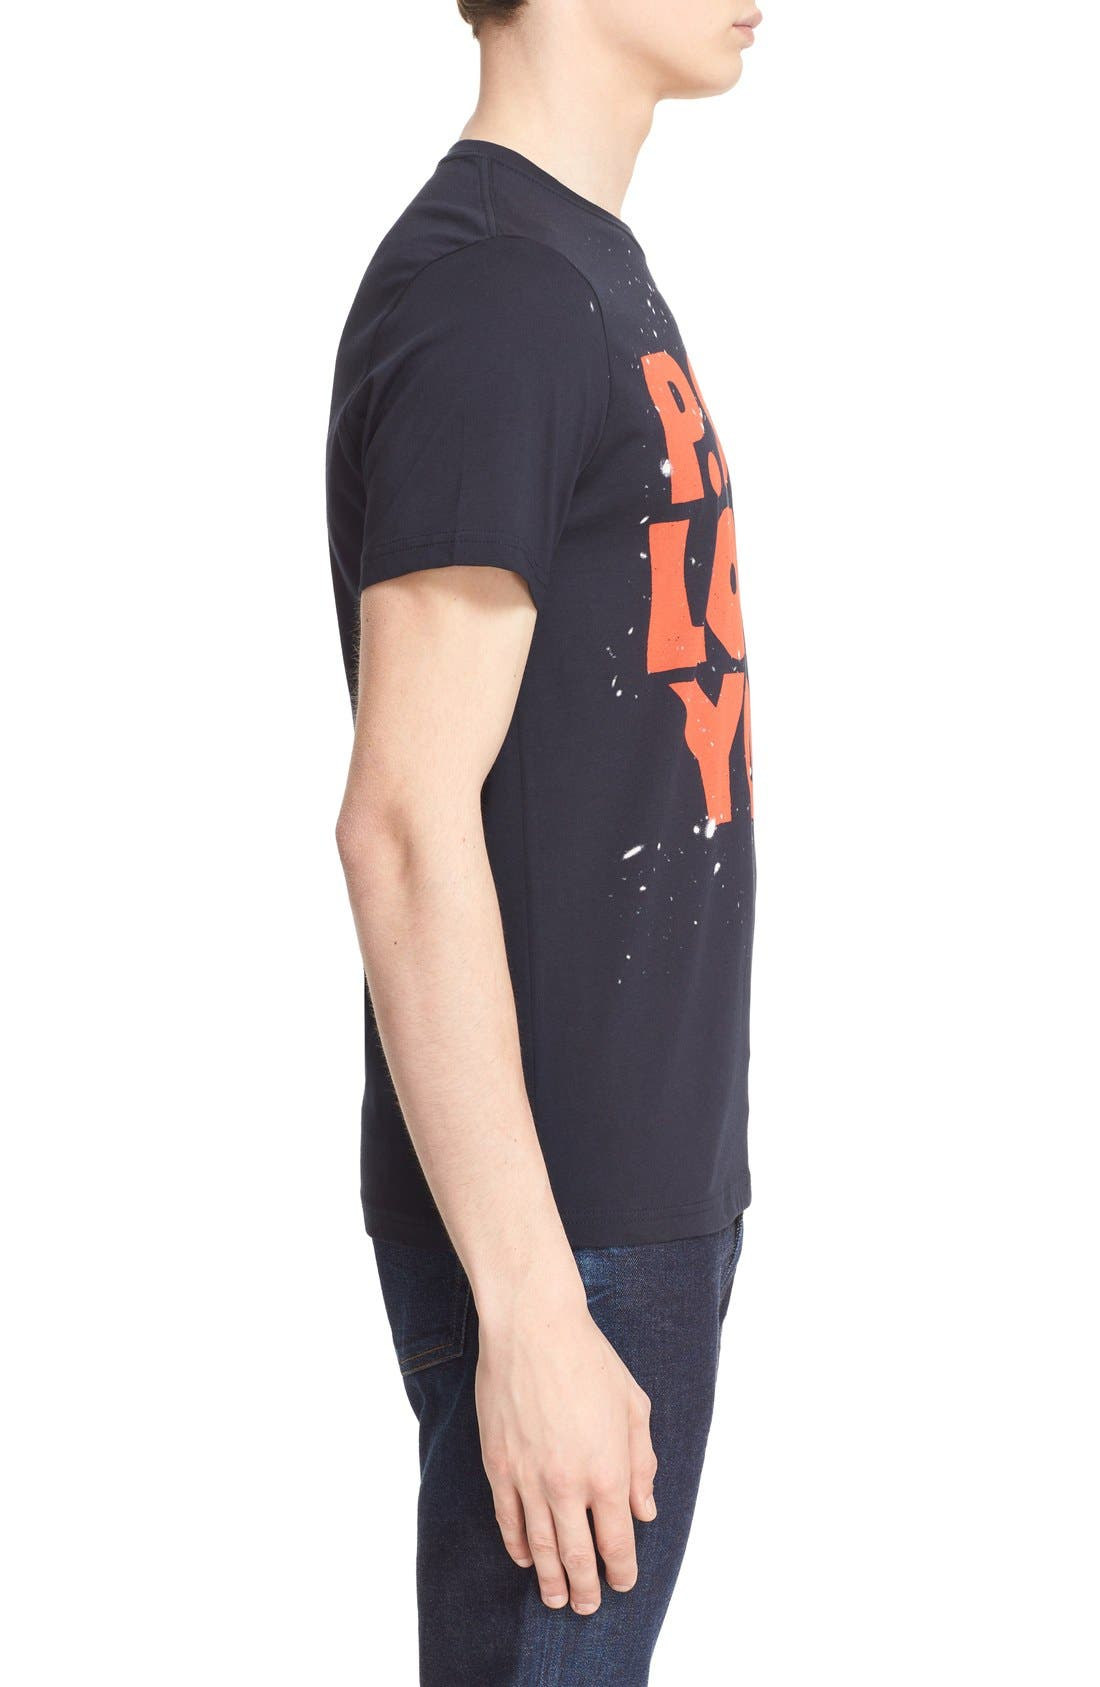 Paul Smith 'P.S. I Love You' Graphic Cotton T-Shirt,                             Alternate thumbnail 5, color,                             414